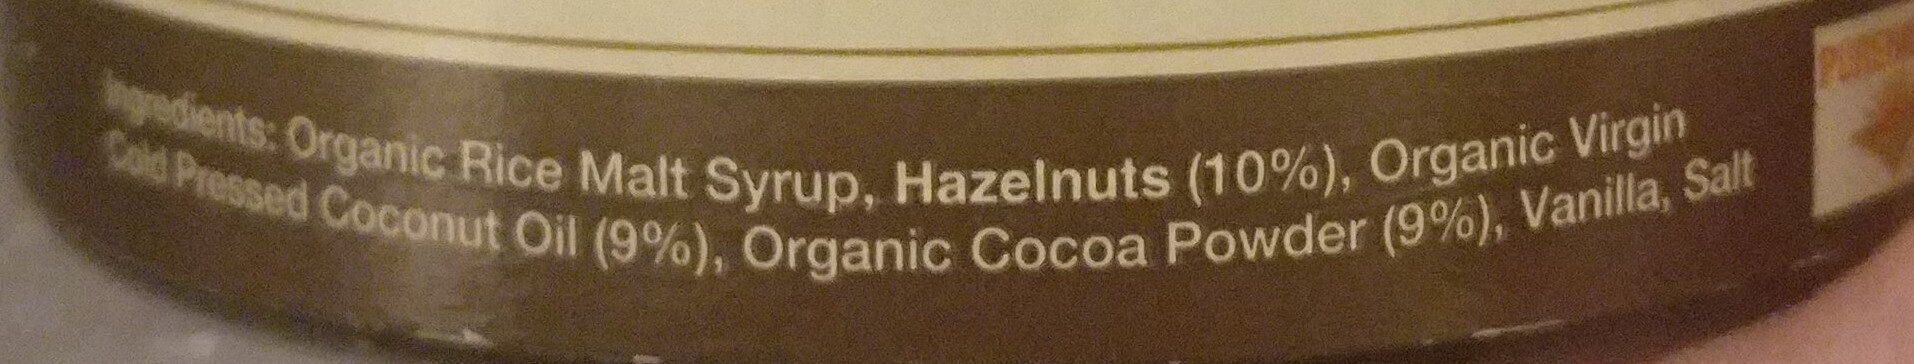 Coco2 Hazelnut Spread 240GM - Ingrédients - en